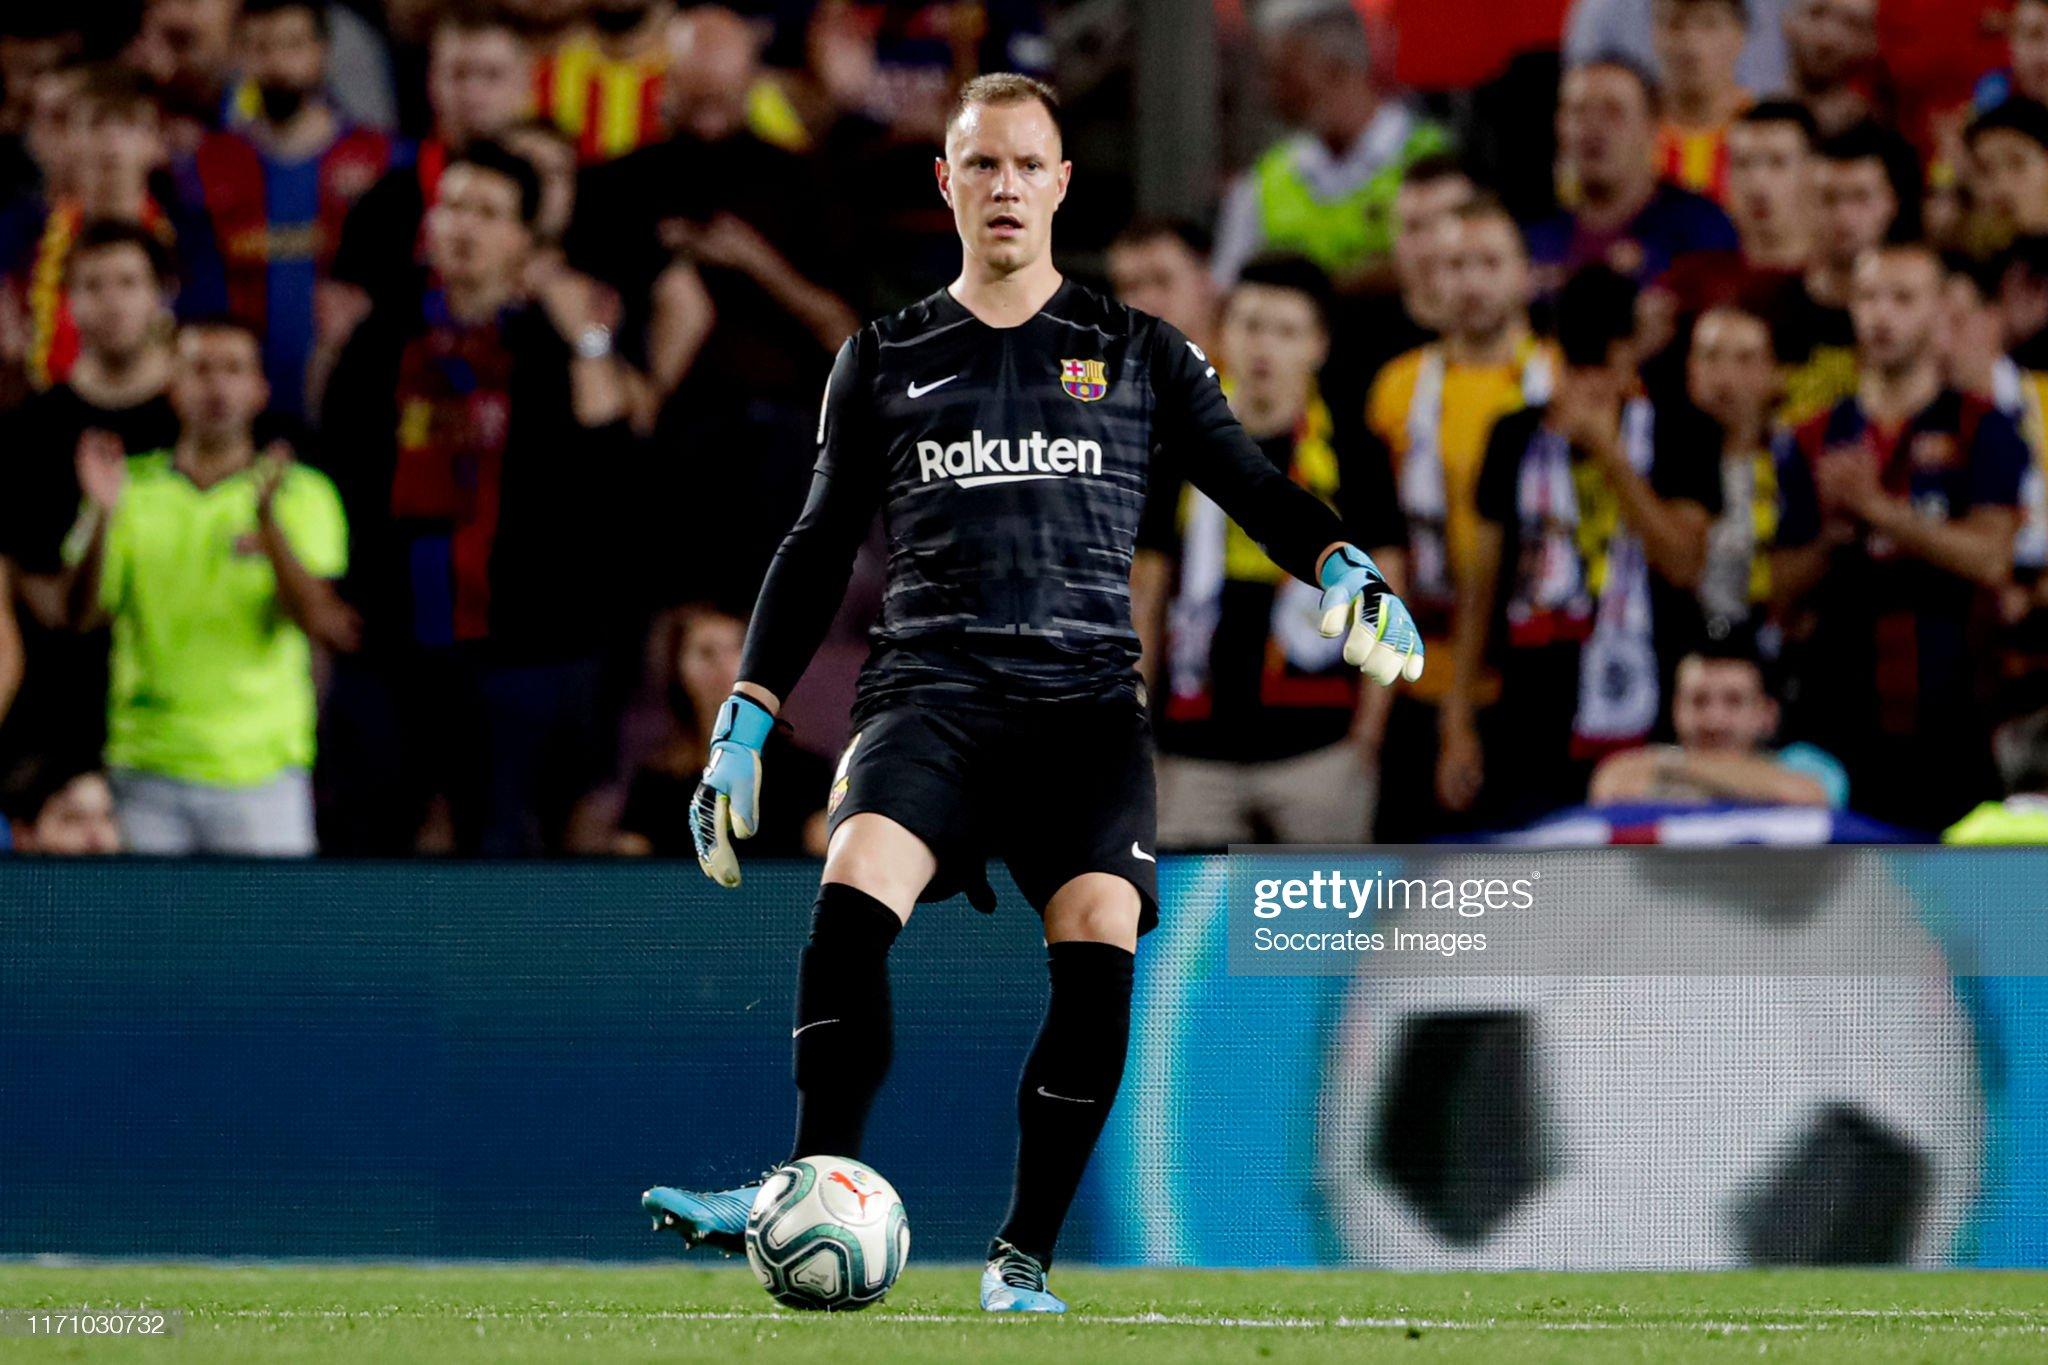 صور مباراة : برشلونة - فياريال 2-1 ( 24-09-2019 )  Marc-andre-ter-stegen-of-fc-barcelona-during-the-la-liga-santander-picture-id1171030732?s=2048x2048